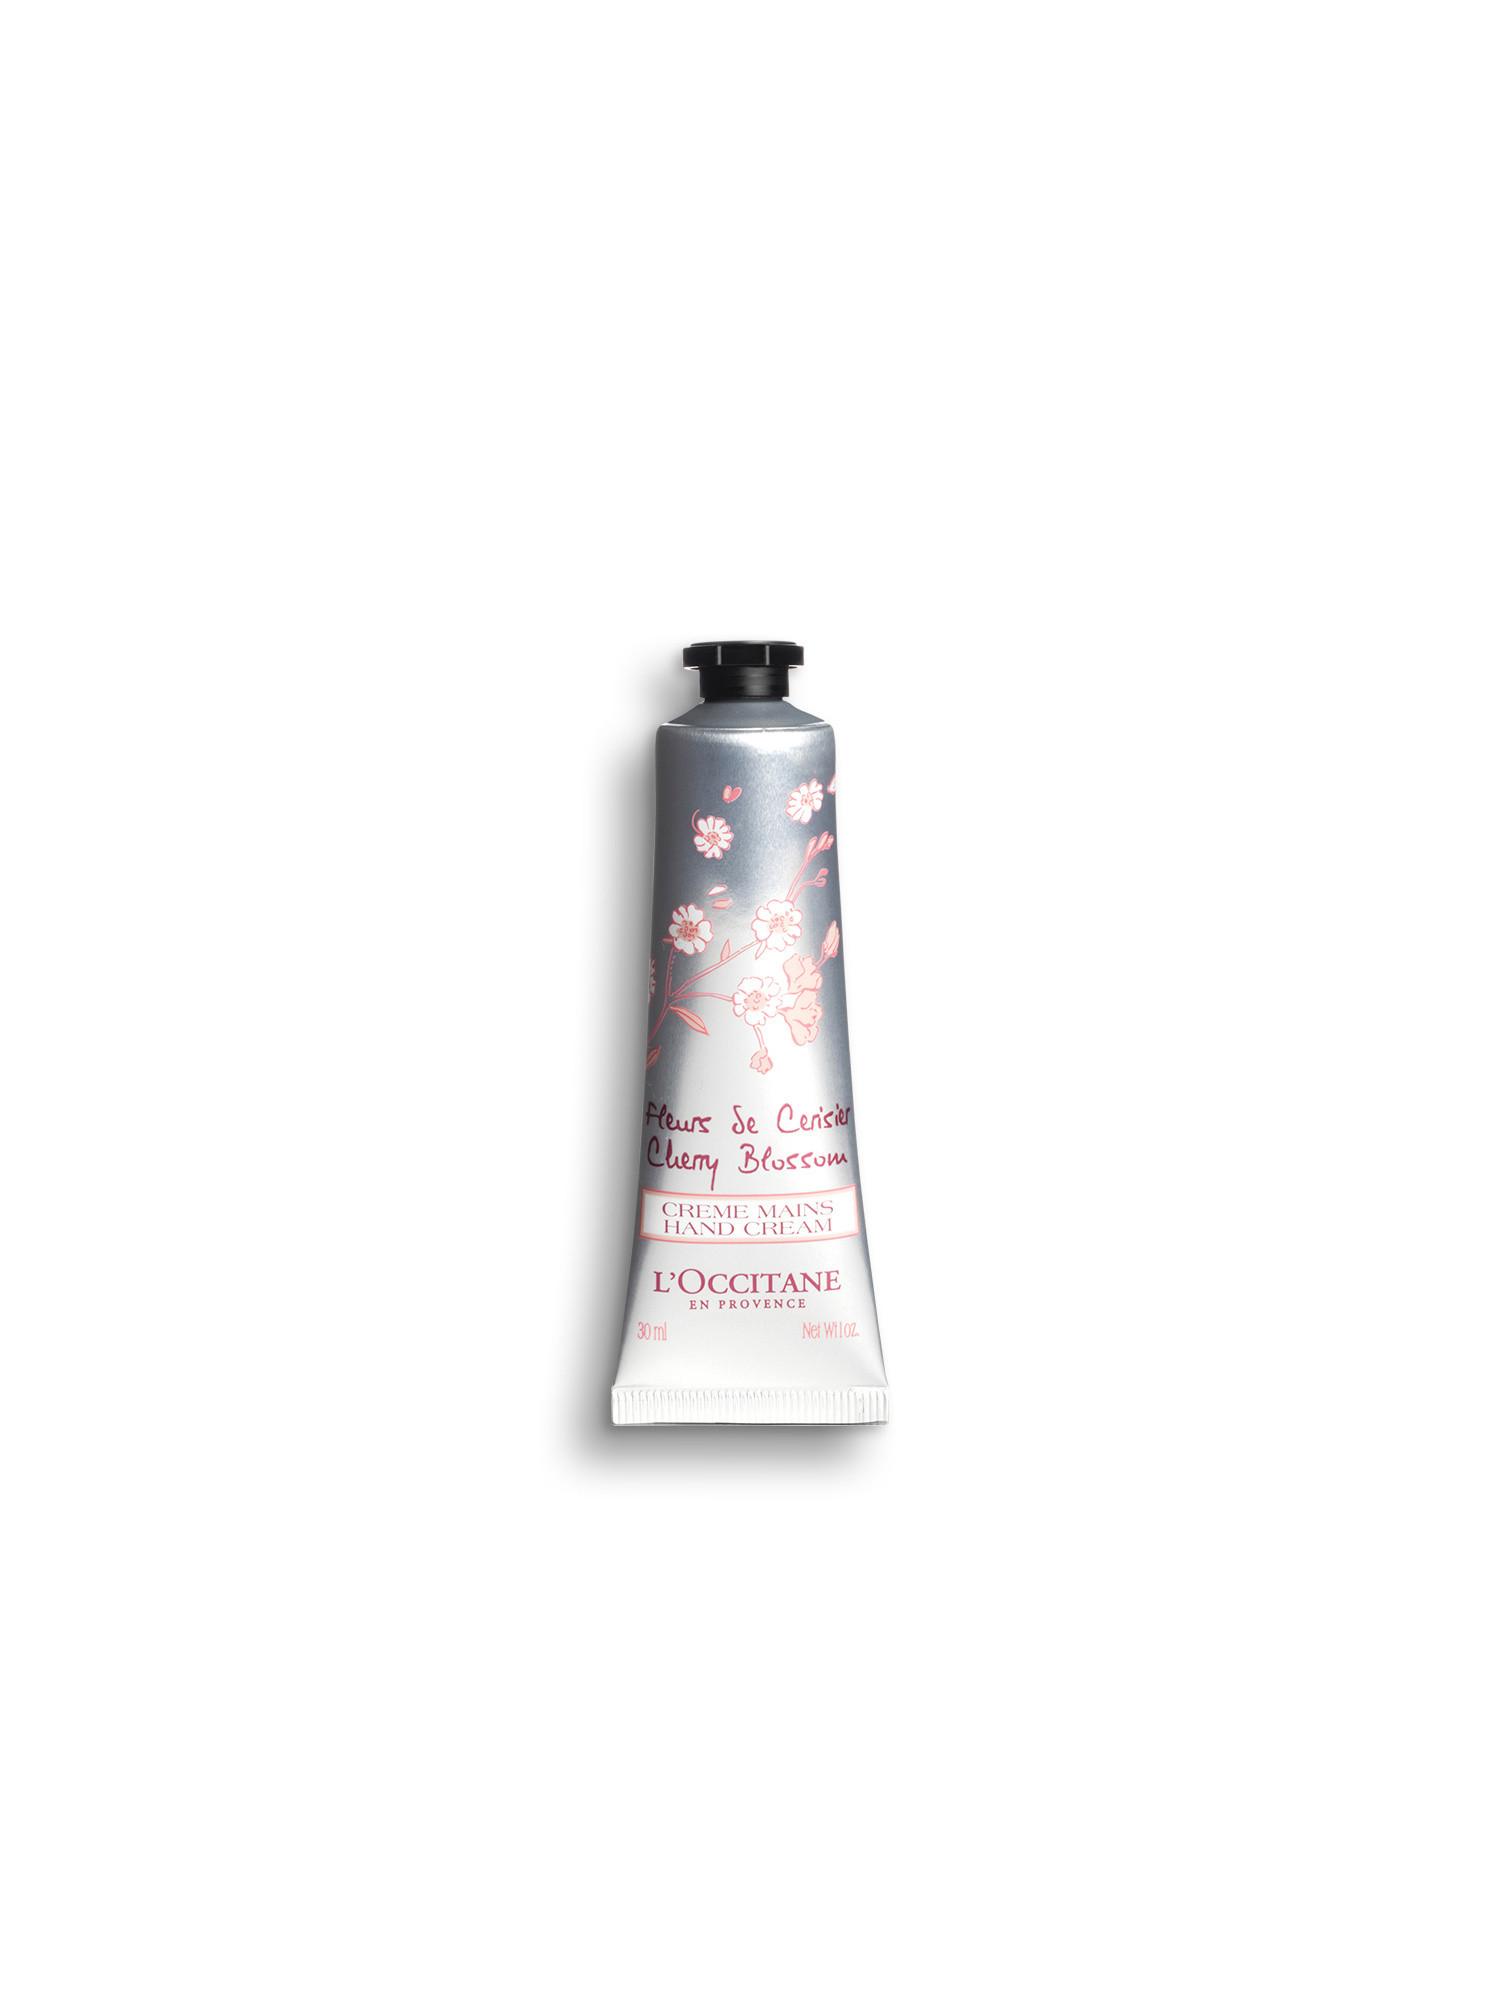 Crema Mani Fiori Di Ciliegio 30 ml, Trasparente, large image number 0